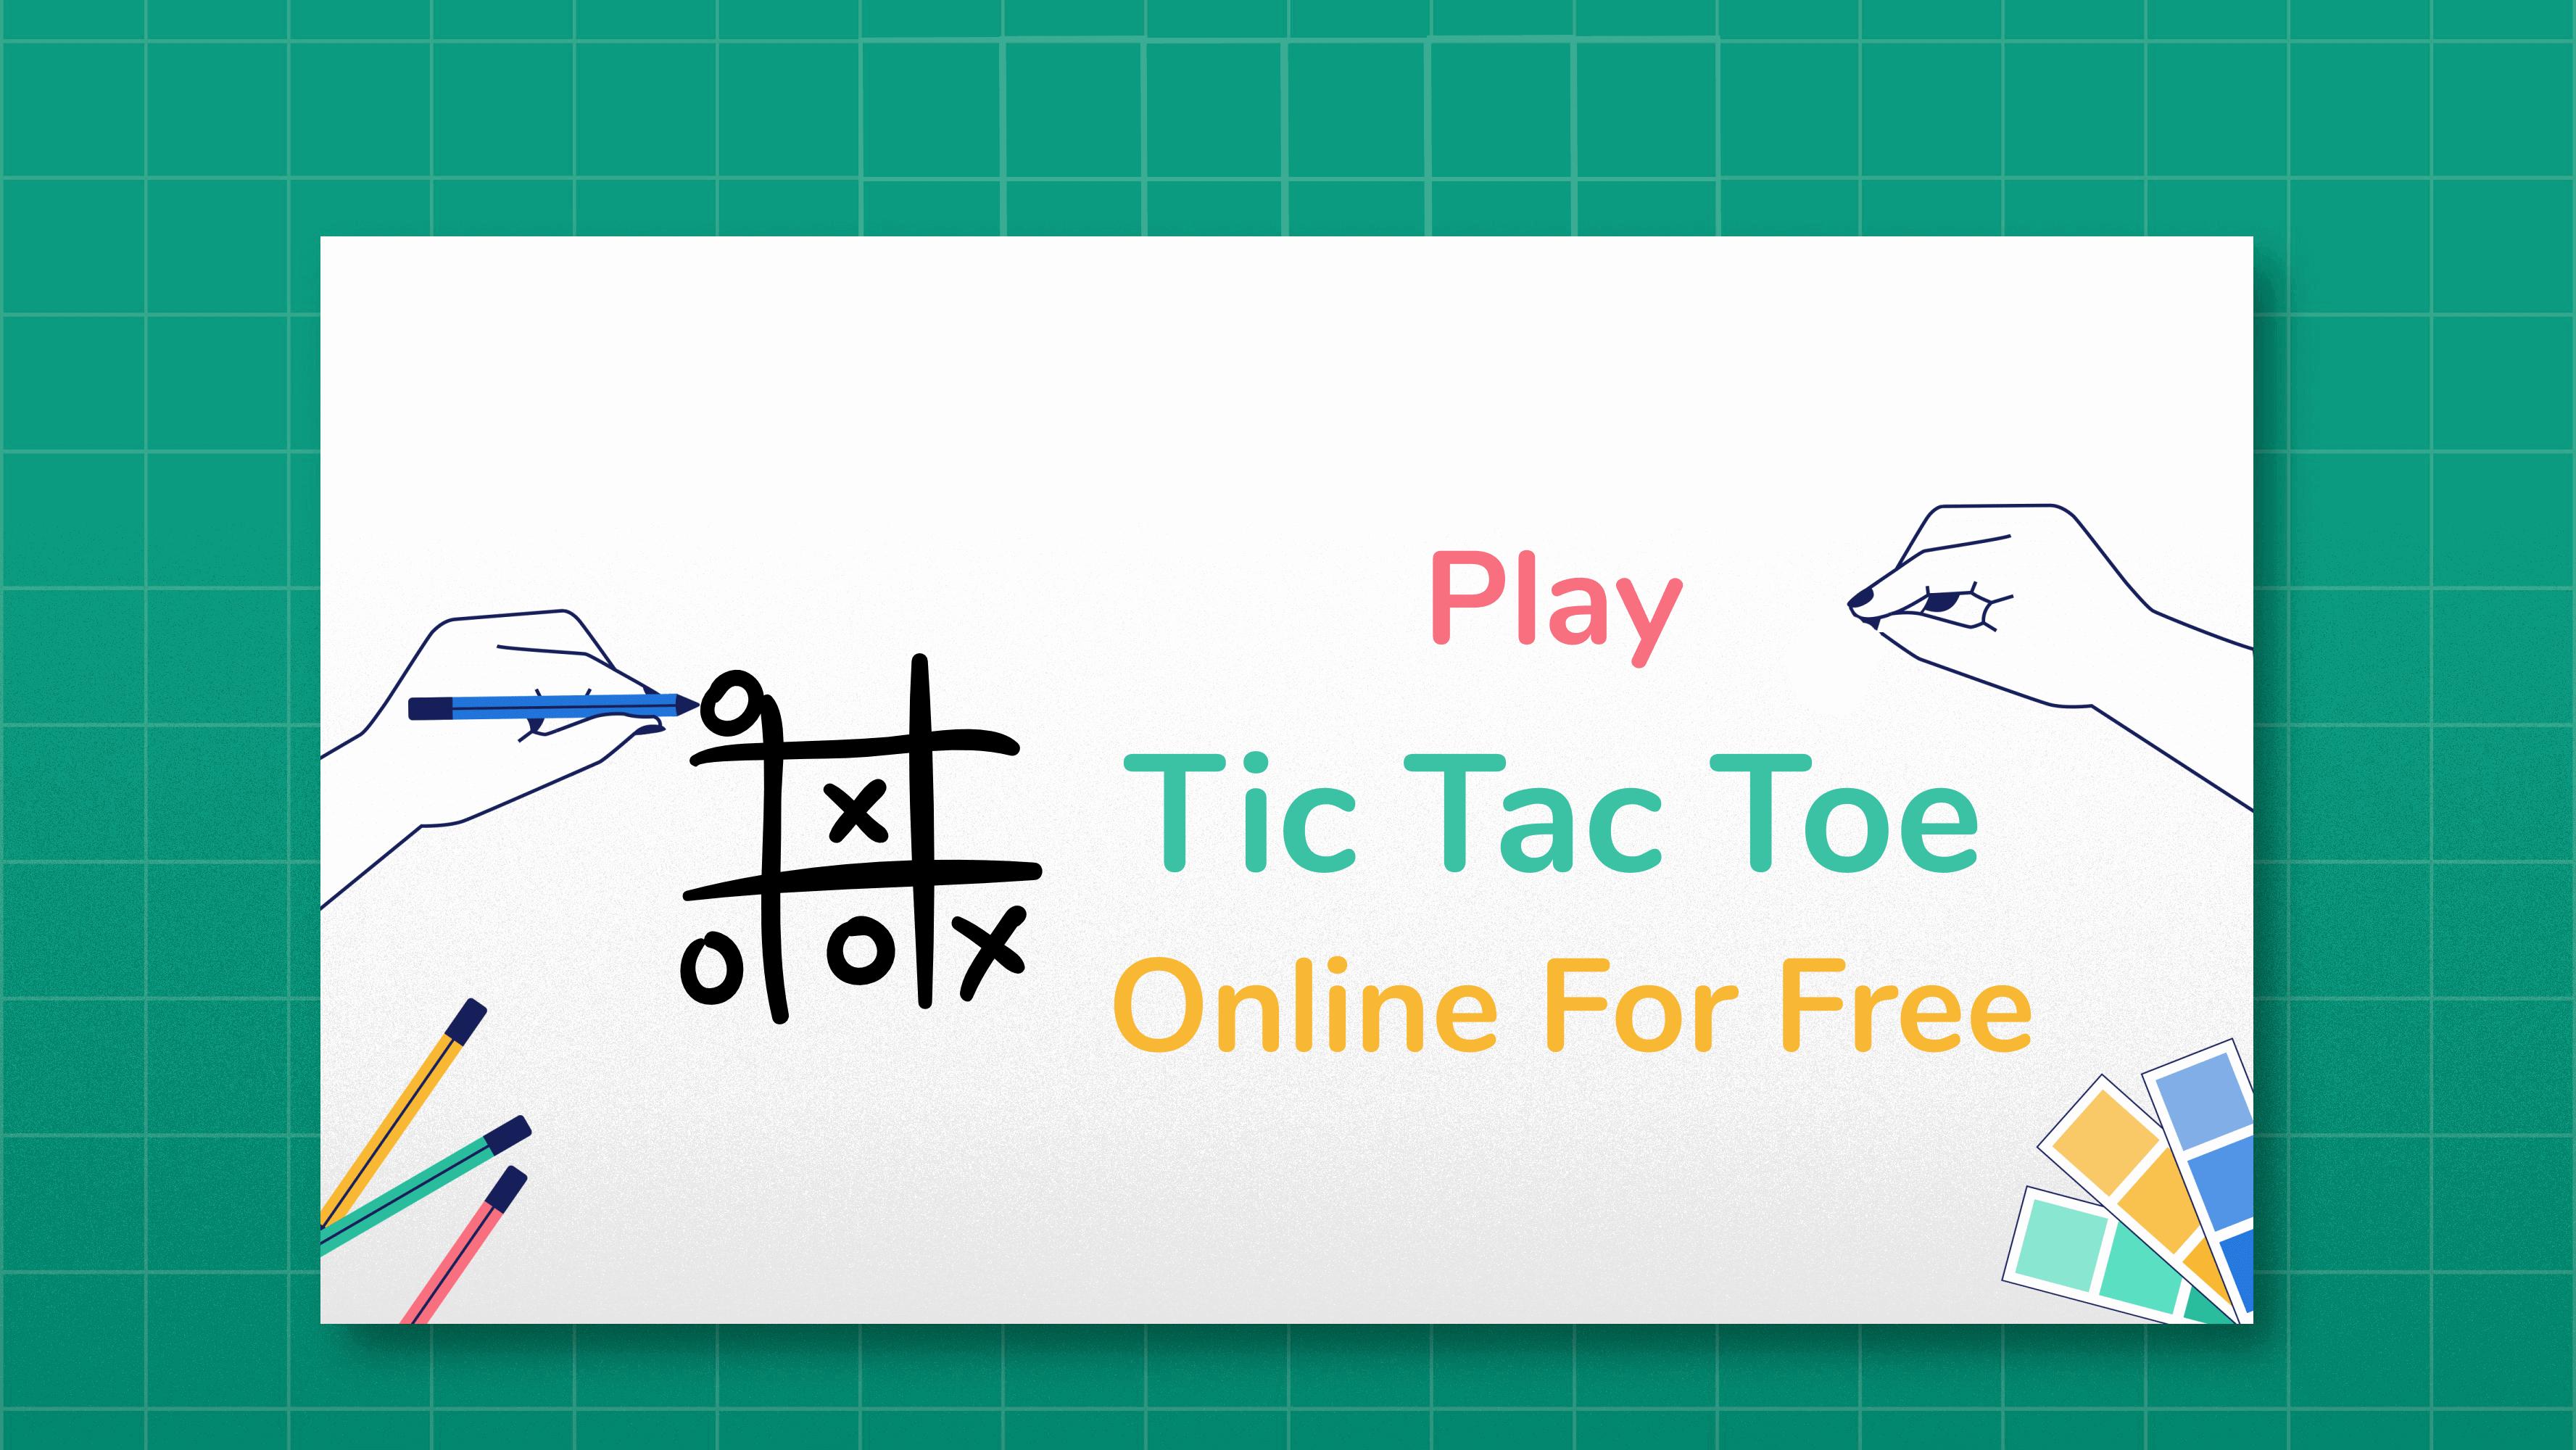 Play Tic Tac Toe Online free